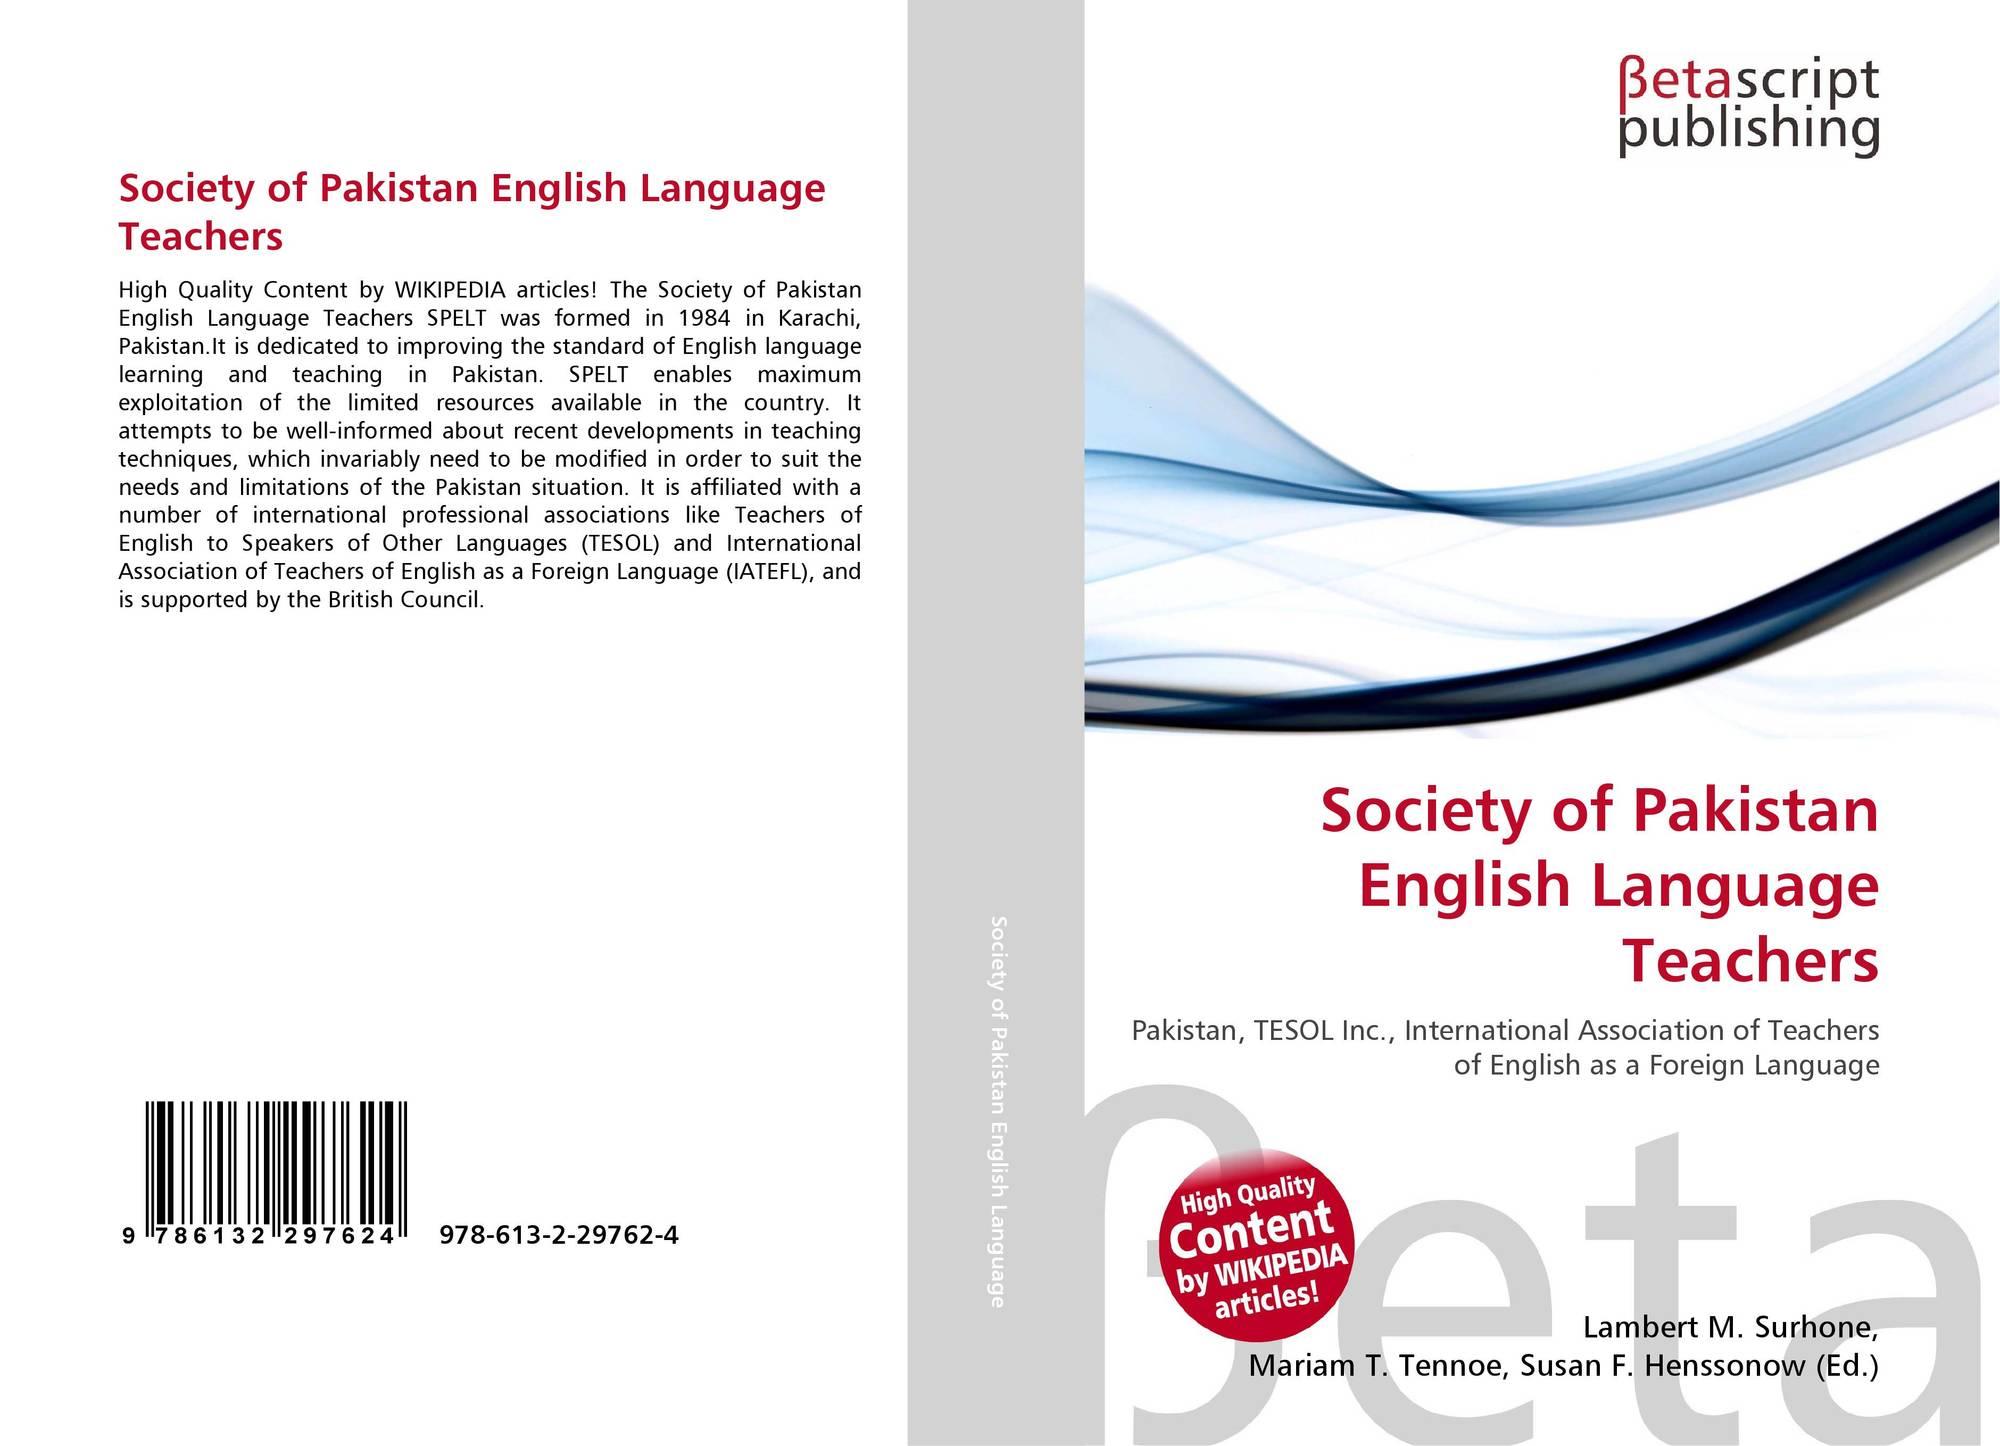 Society of Pakistan English Language Teachers, 978-613-2